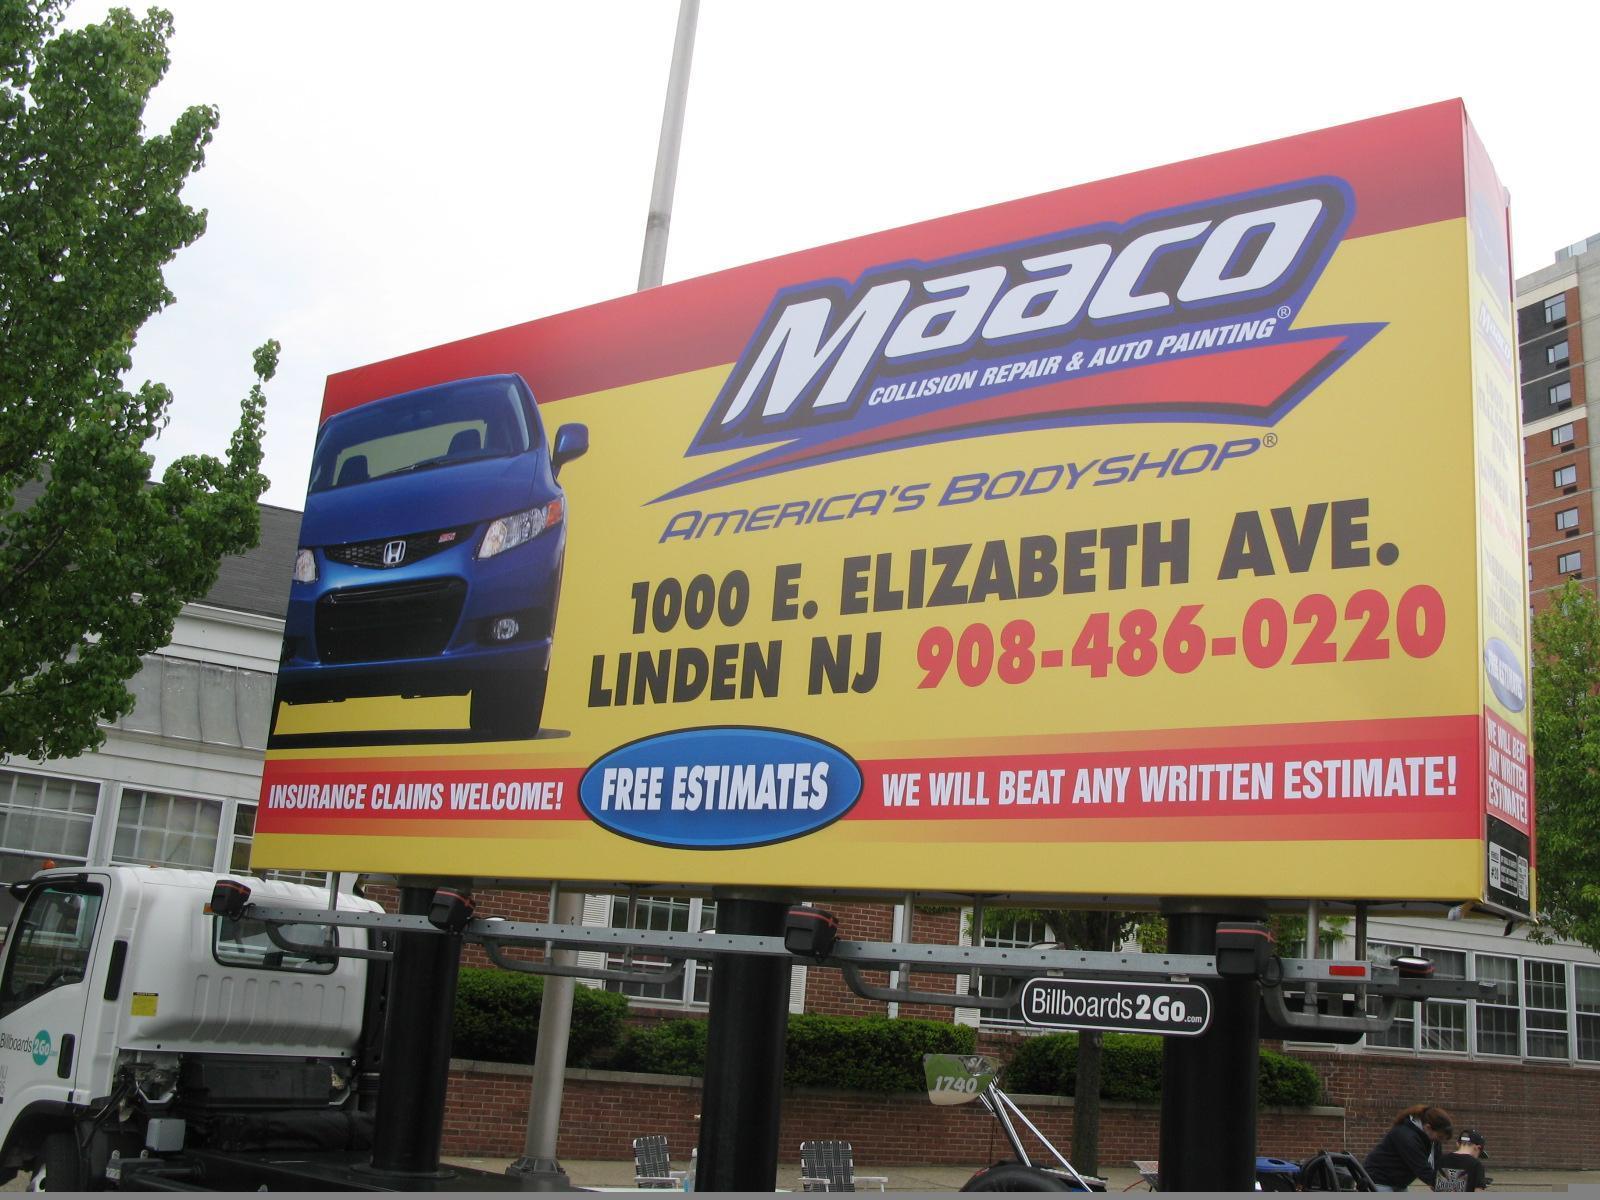 Maaco Collision Repair Auto Painting Linden Nj